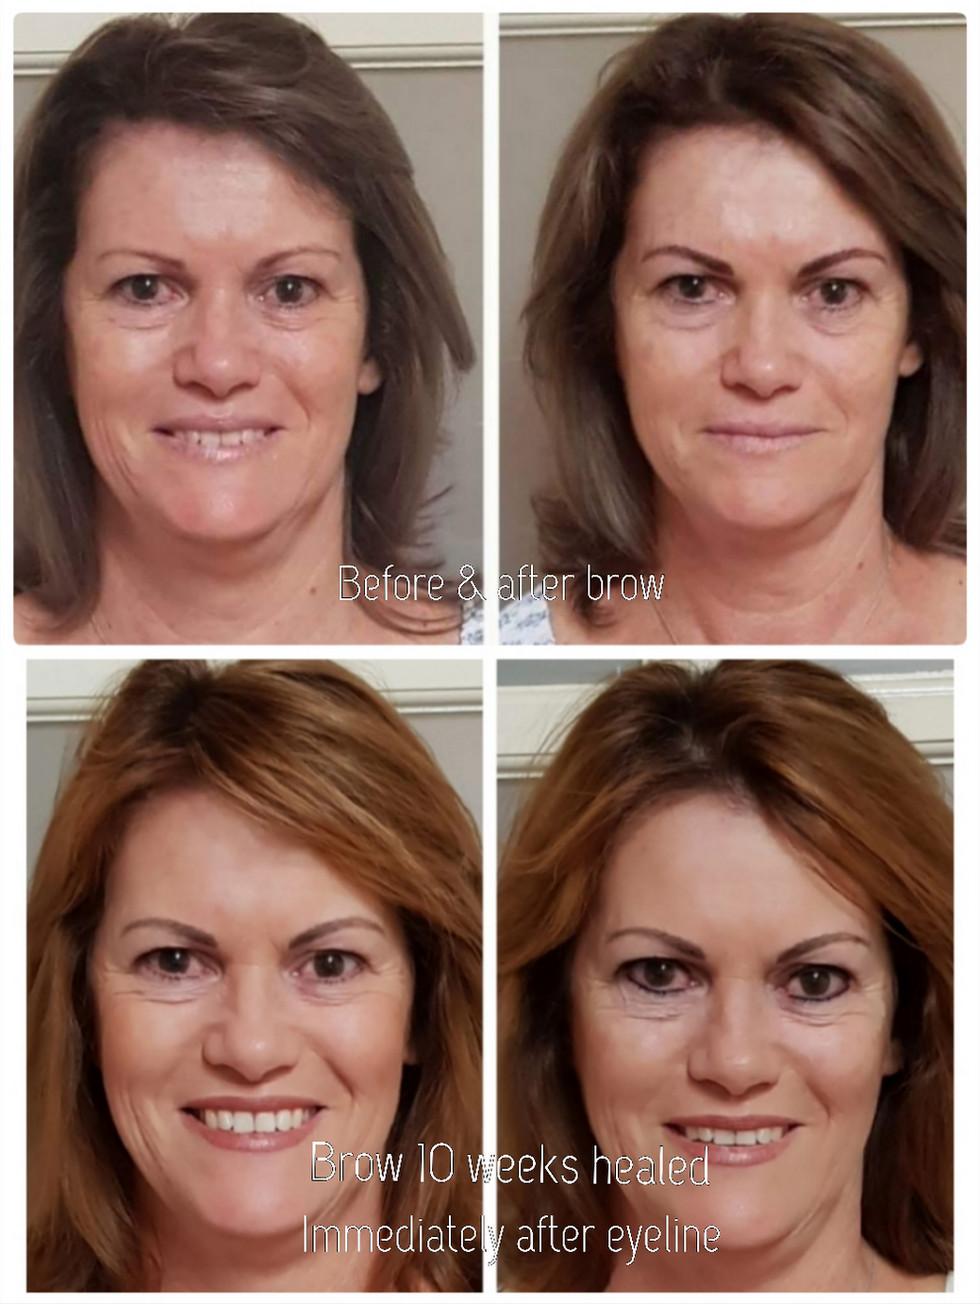 Stunning Transformation